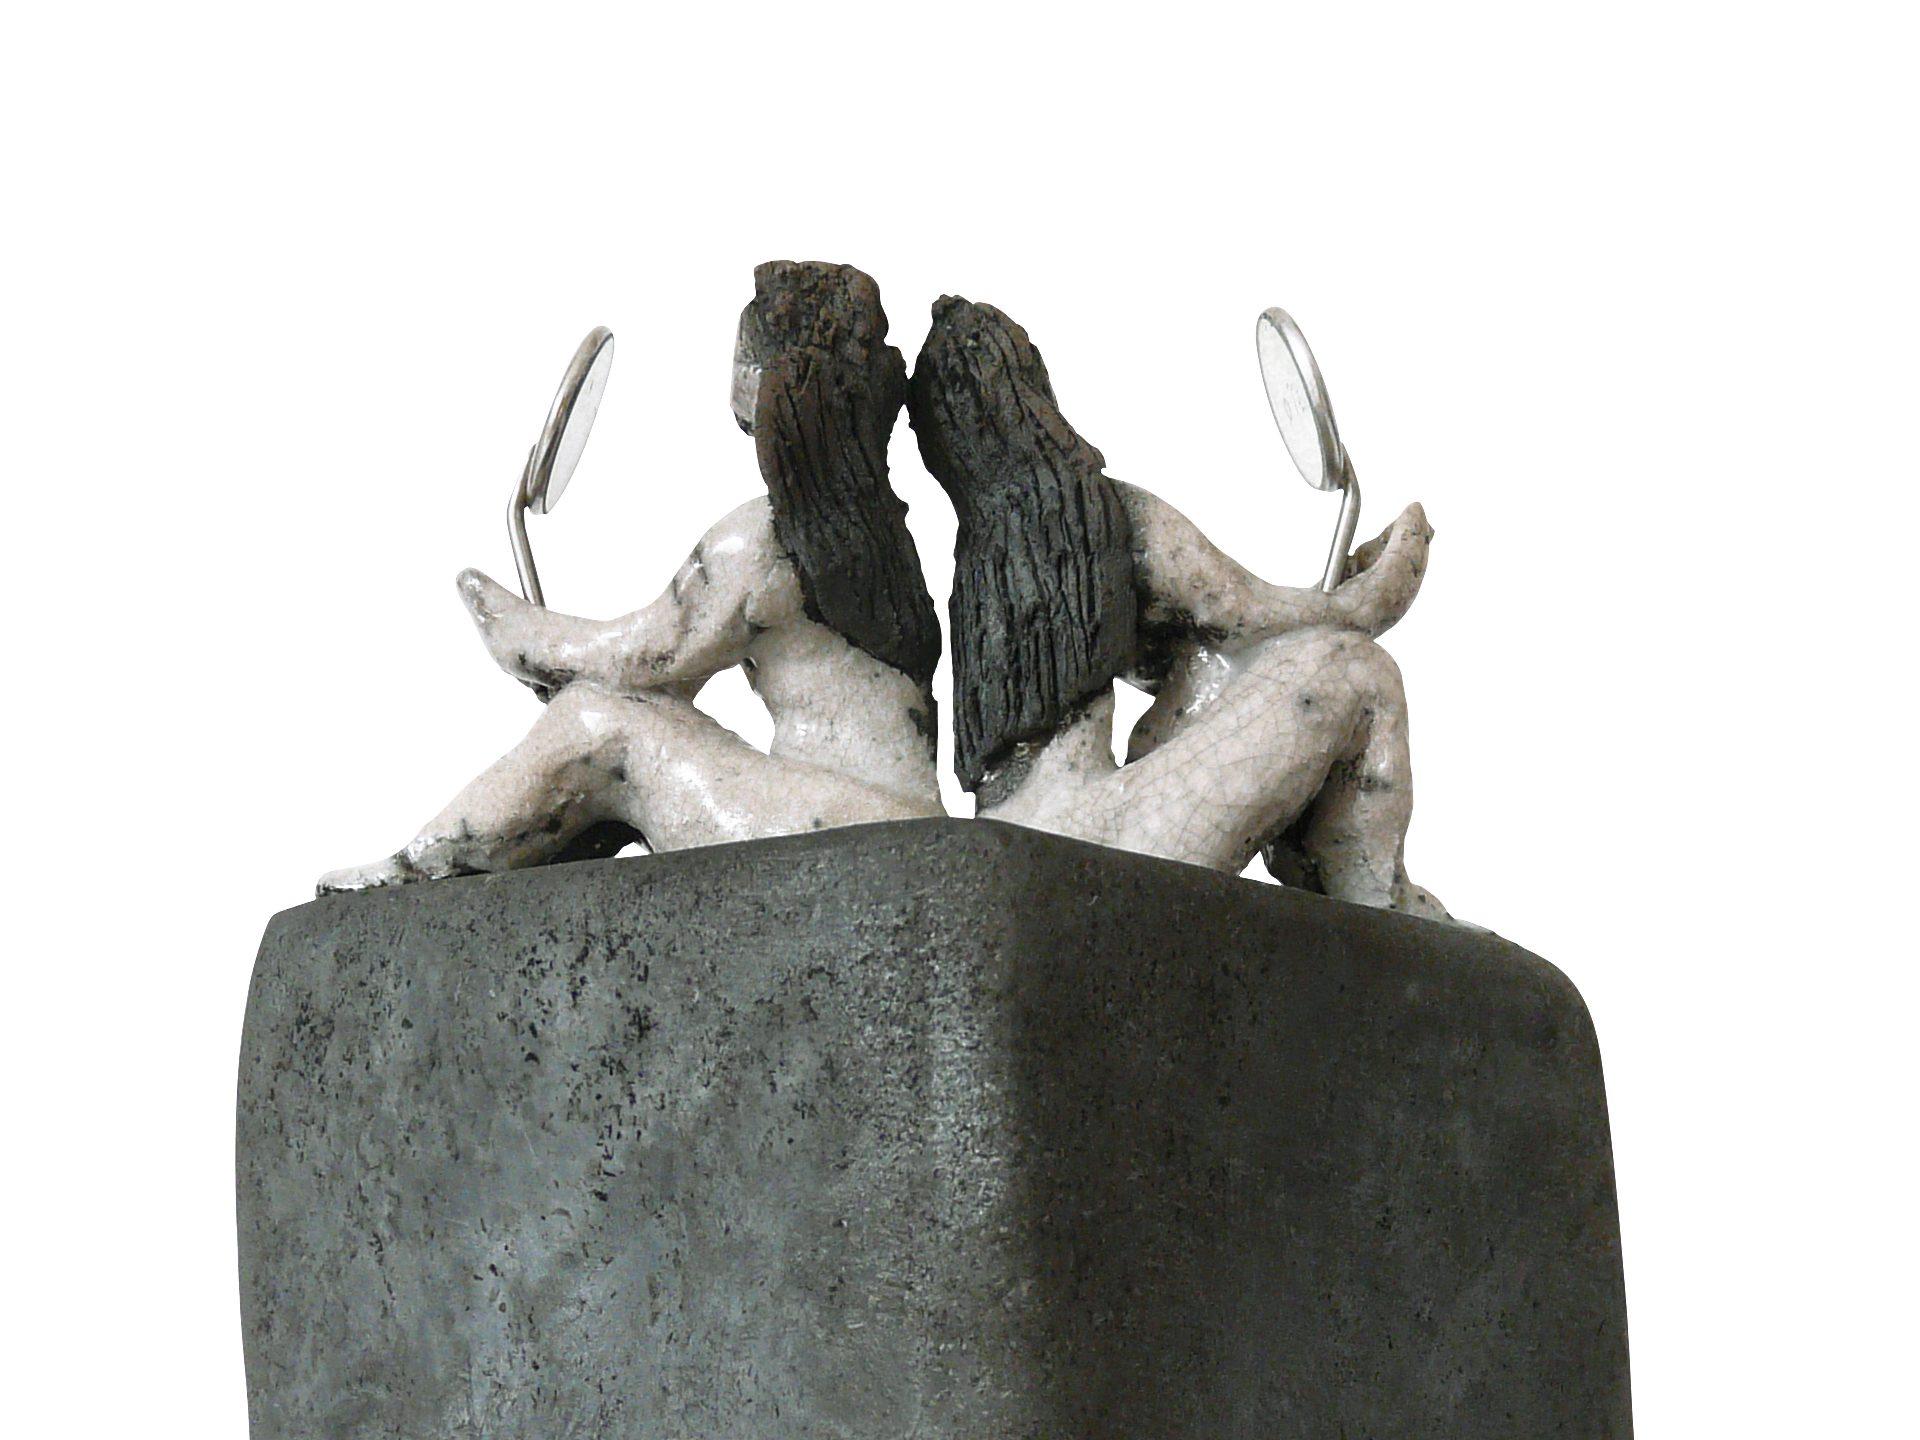 Miroir miroir, dis-moi - Grès - Raku - Sculptures céramique de Florence Lemiegre